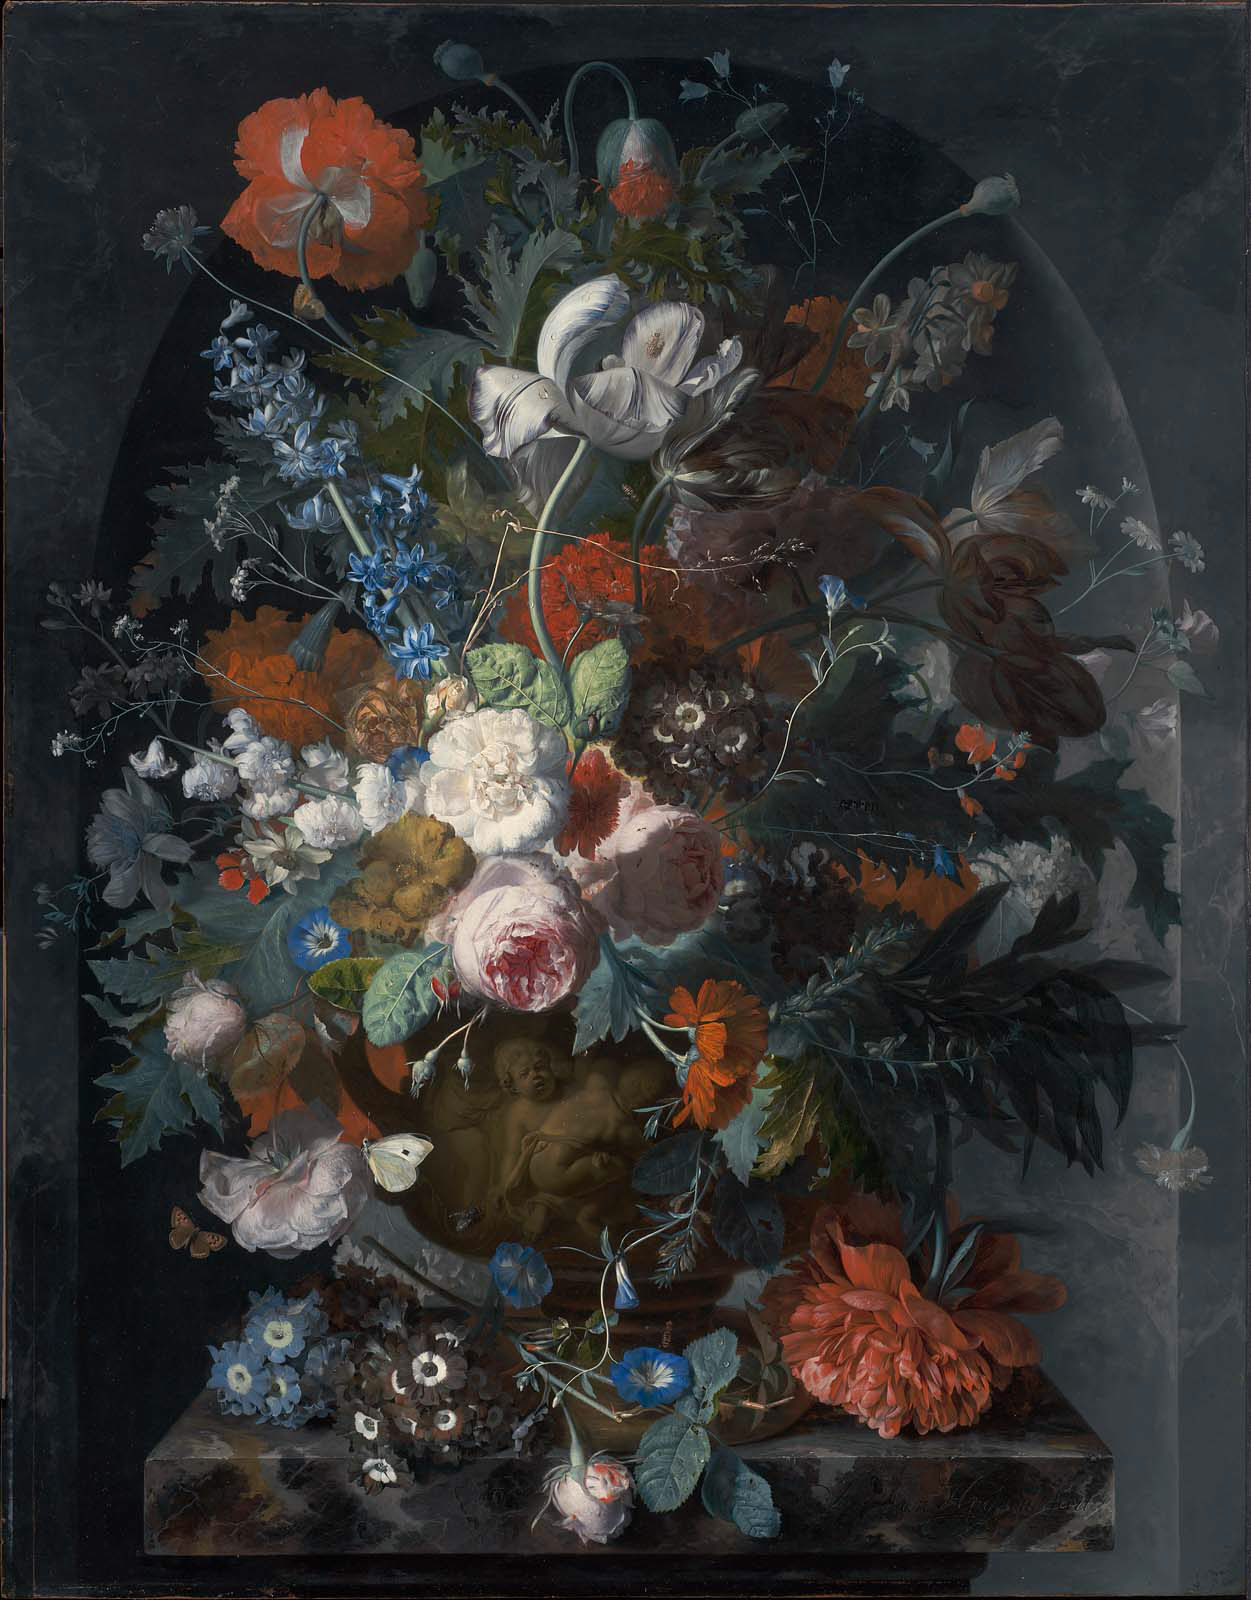 us metalcraft vases, niche flower holders, cemetery vases, floral vases, niche wall art, graveside vases, bud vases, on flower vase for niches